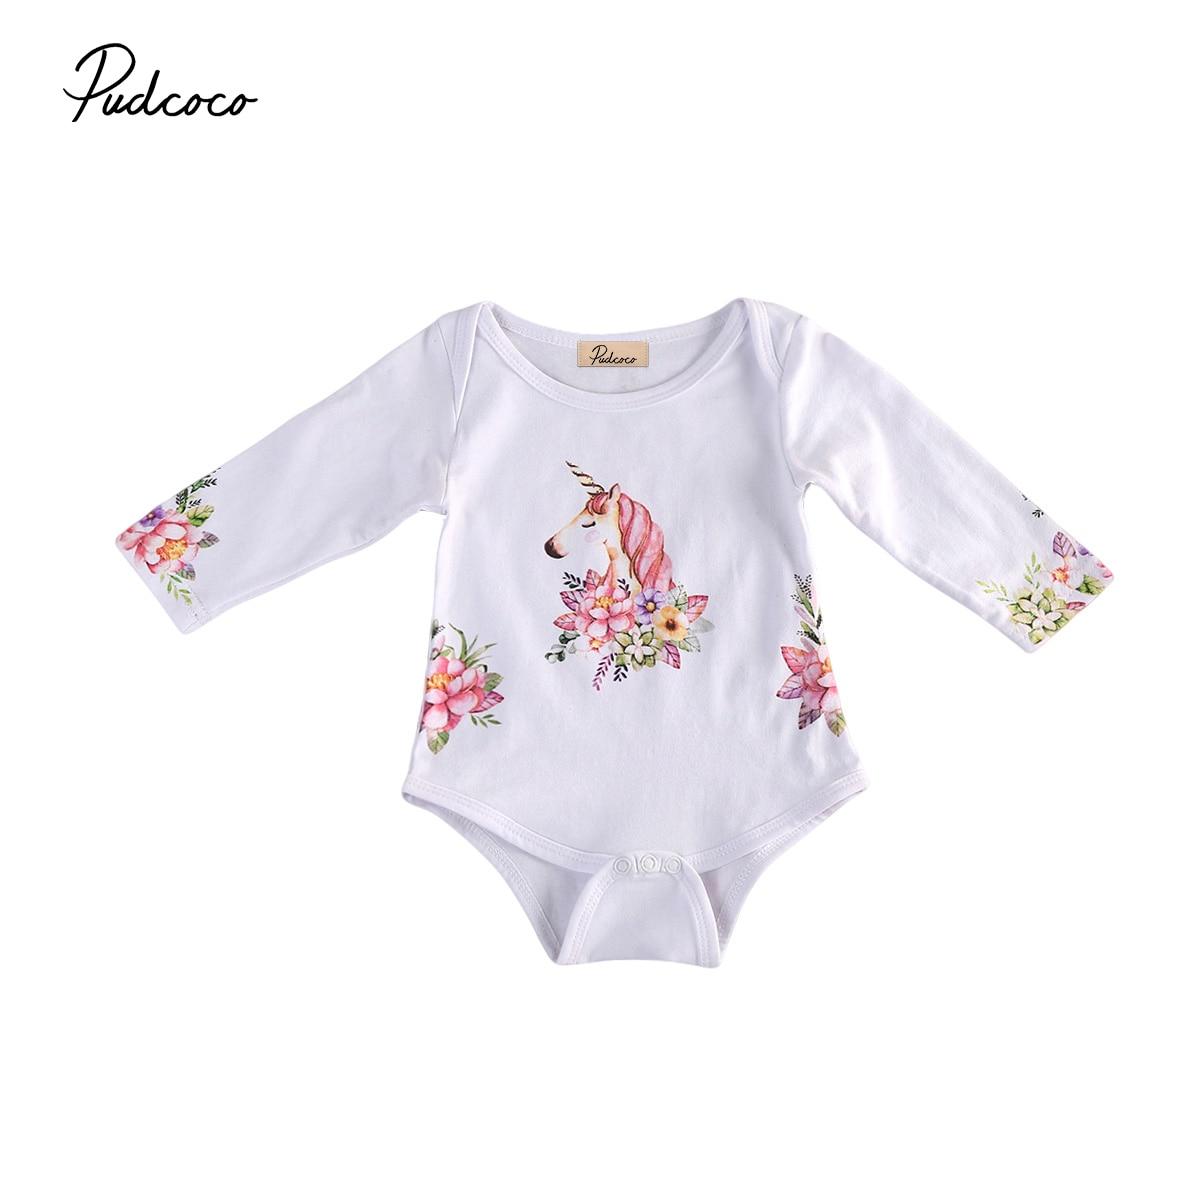 Pudcoco Long Sleeve Unicorn   Romper   Newborn Baby Boys Girls Cotton